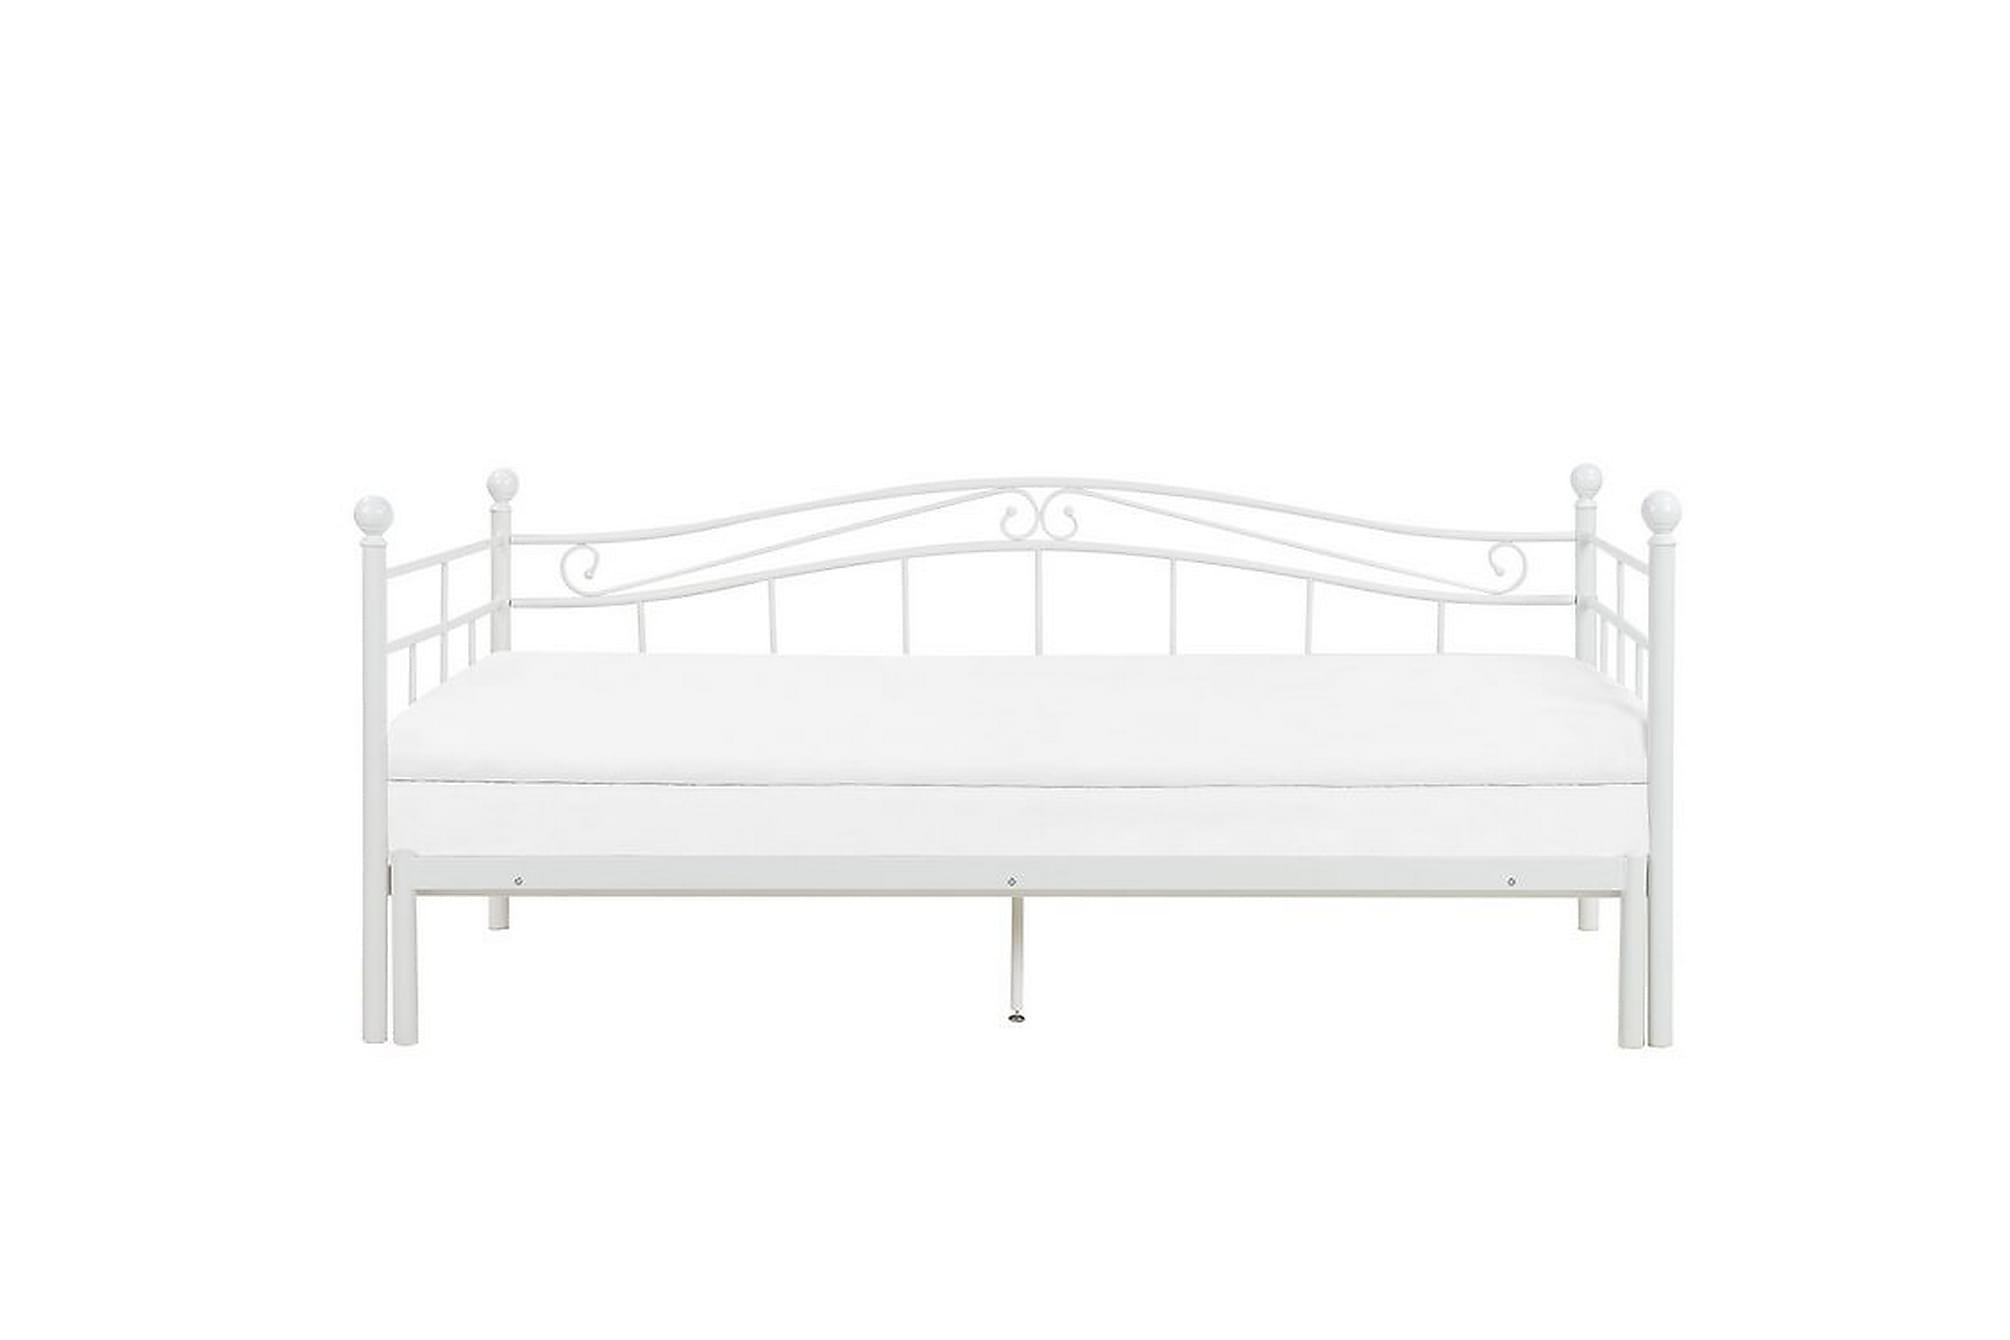 AKKASTUGAN Säng 160x200 cm Vit, Ramsängar